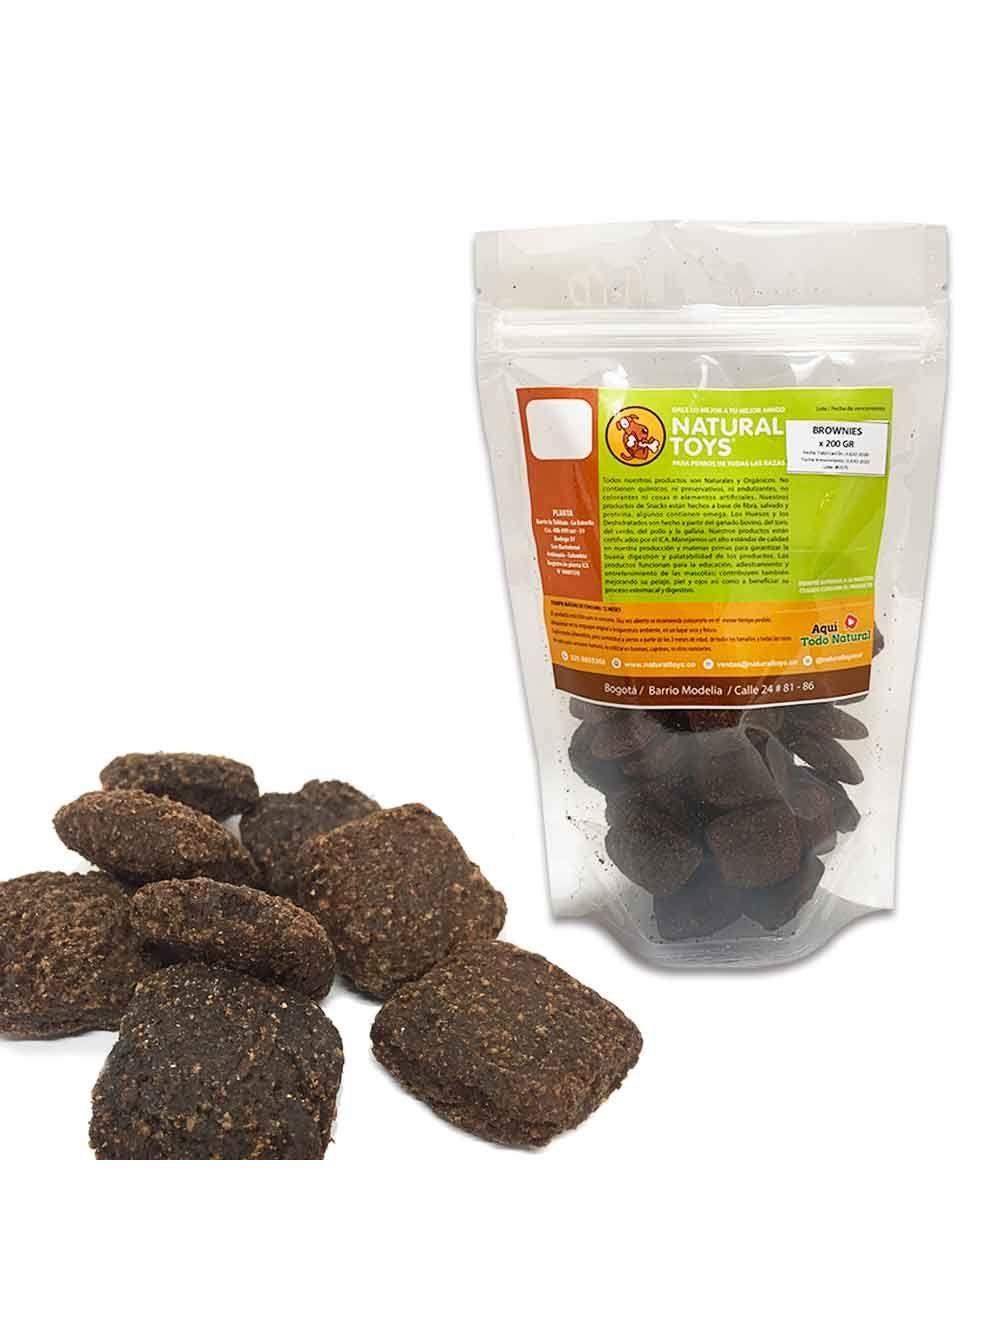 Brownies De Proteína Y Fibra Natural 200 Gr